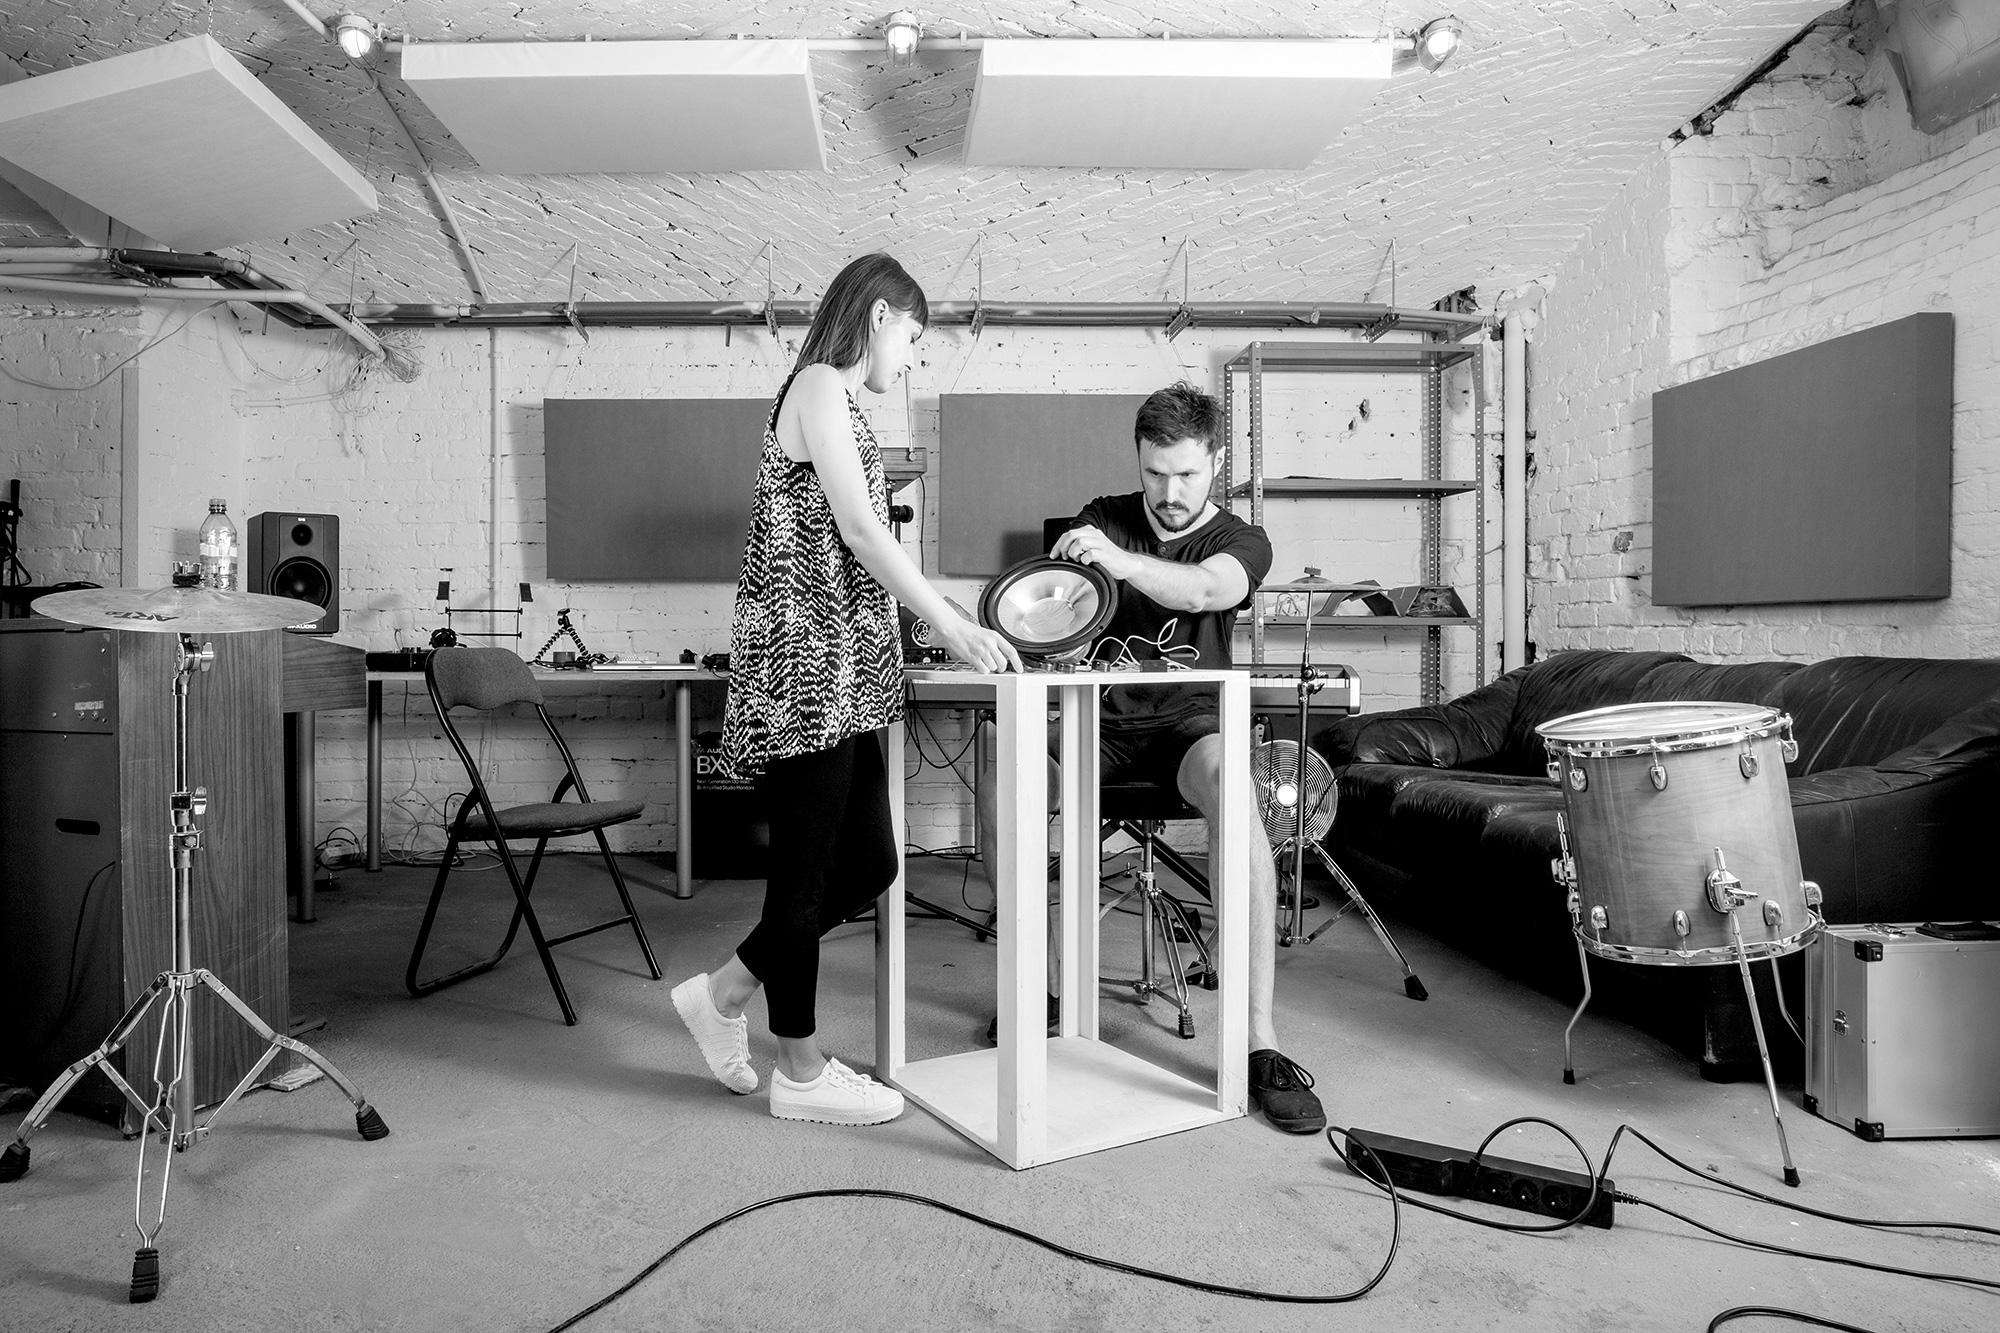 Ewa Doroszenko and Jacek Doroszenko at the studio, Propaganda, Warsaw Gallery Weekend